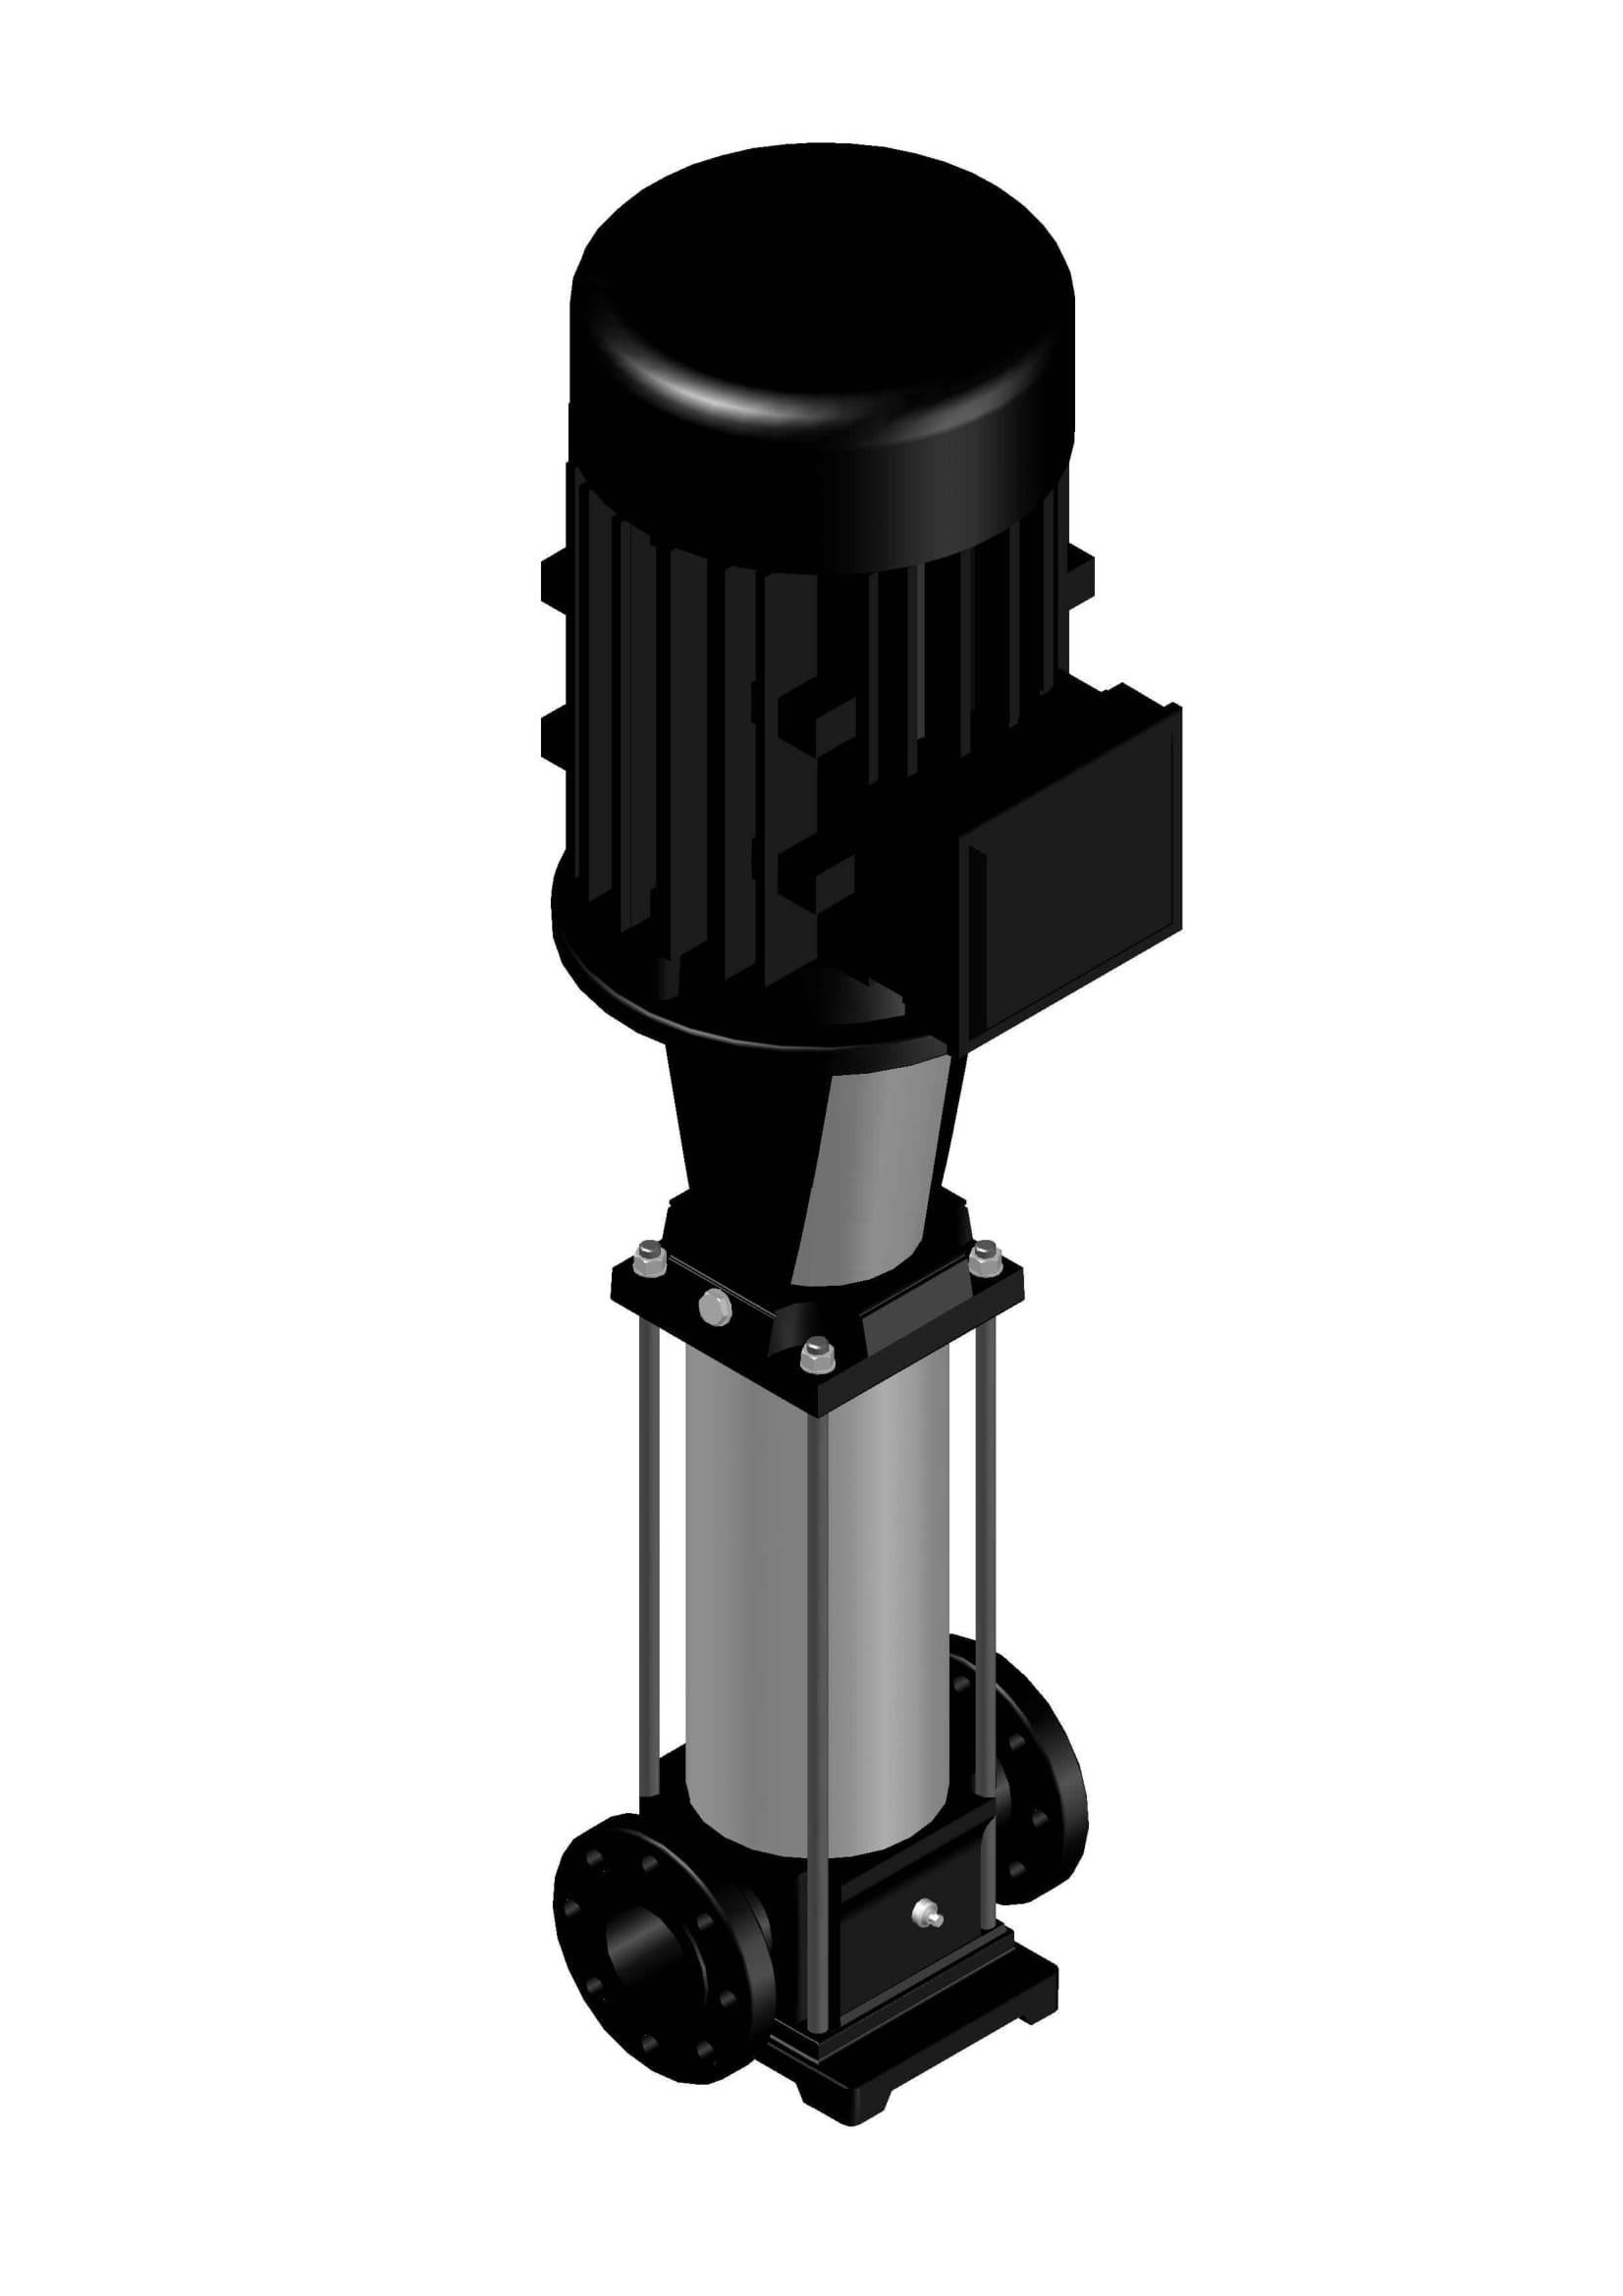 BV 64-06-01